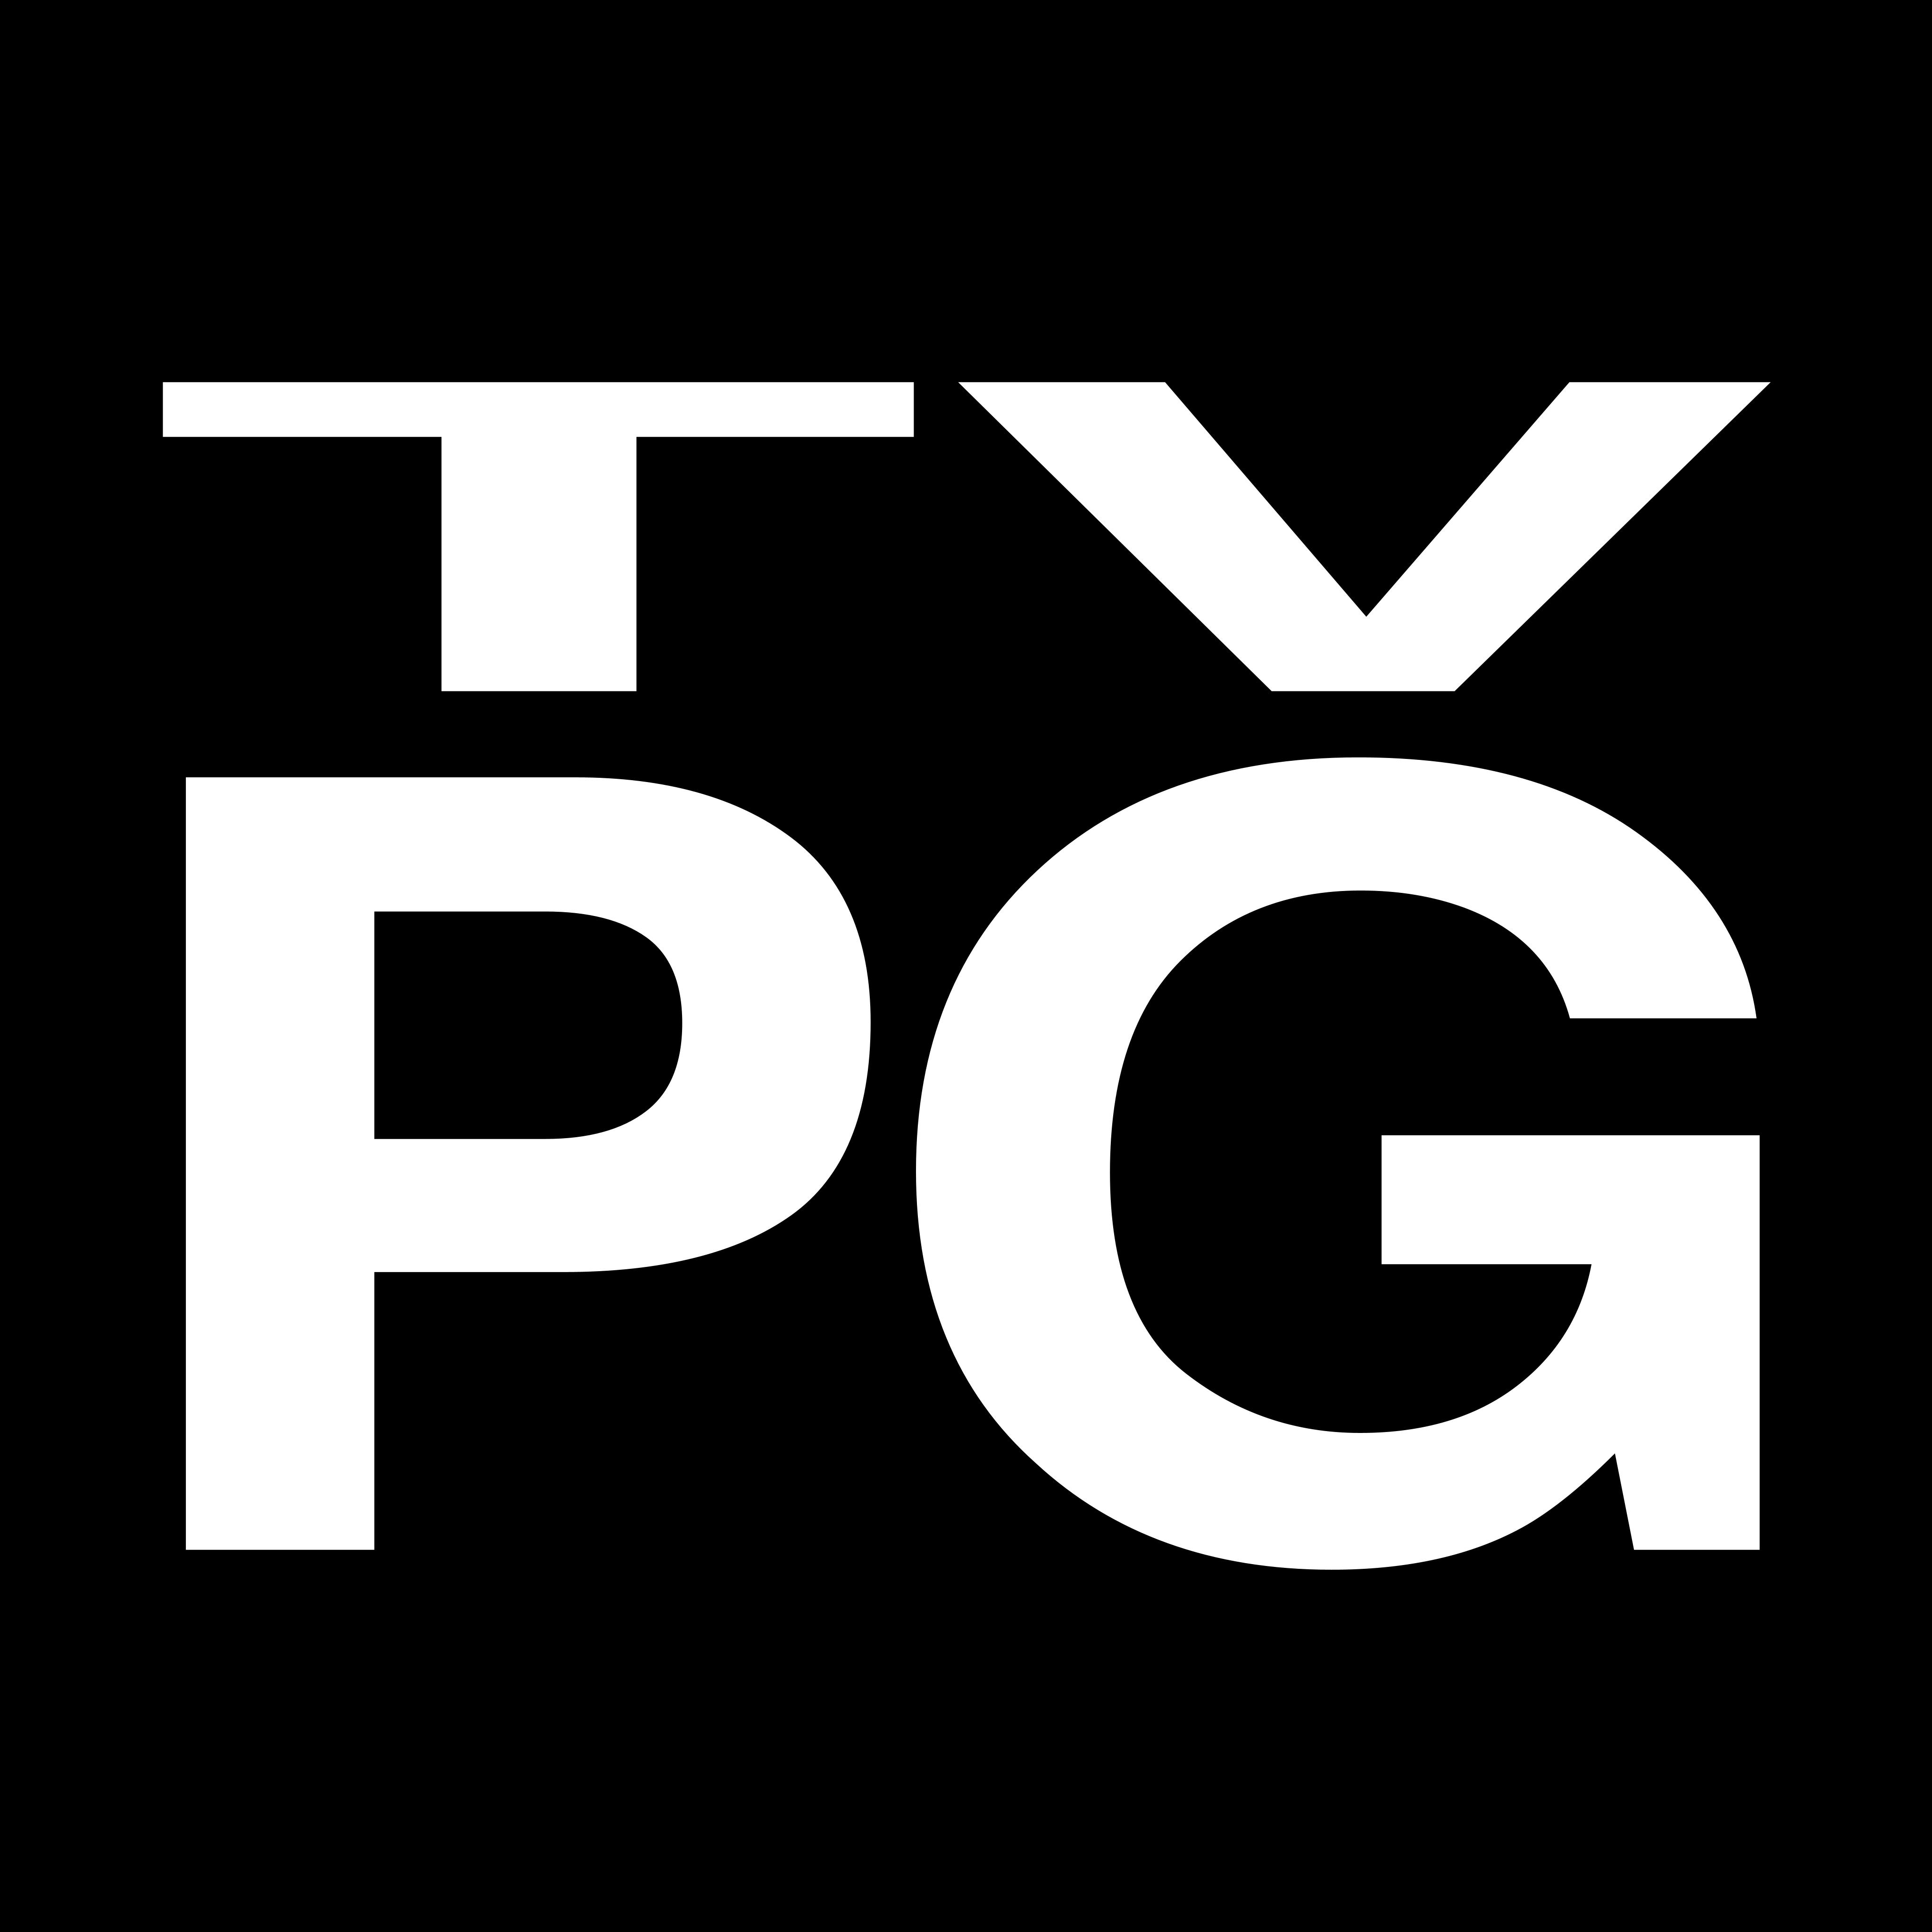 TV-PG